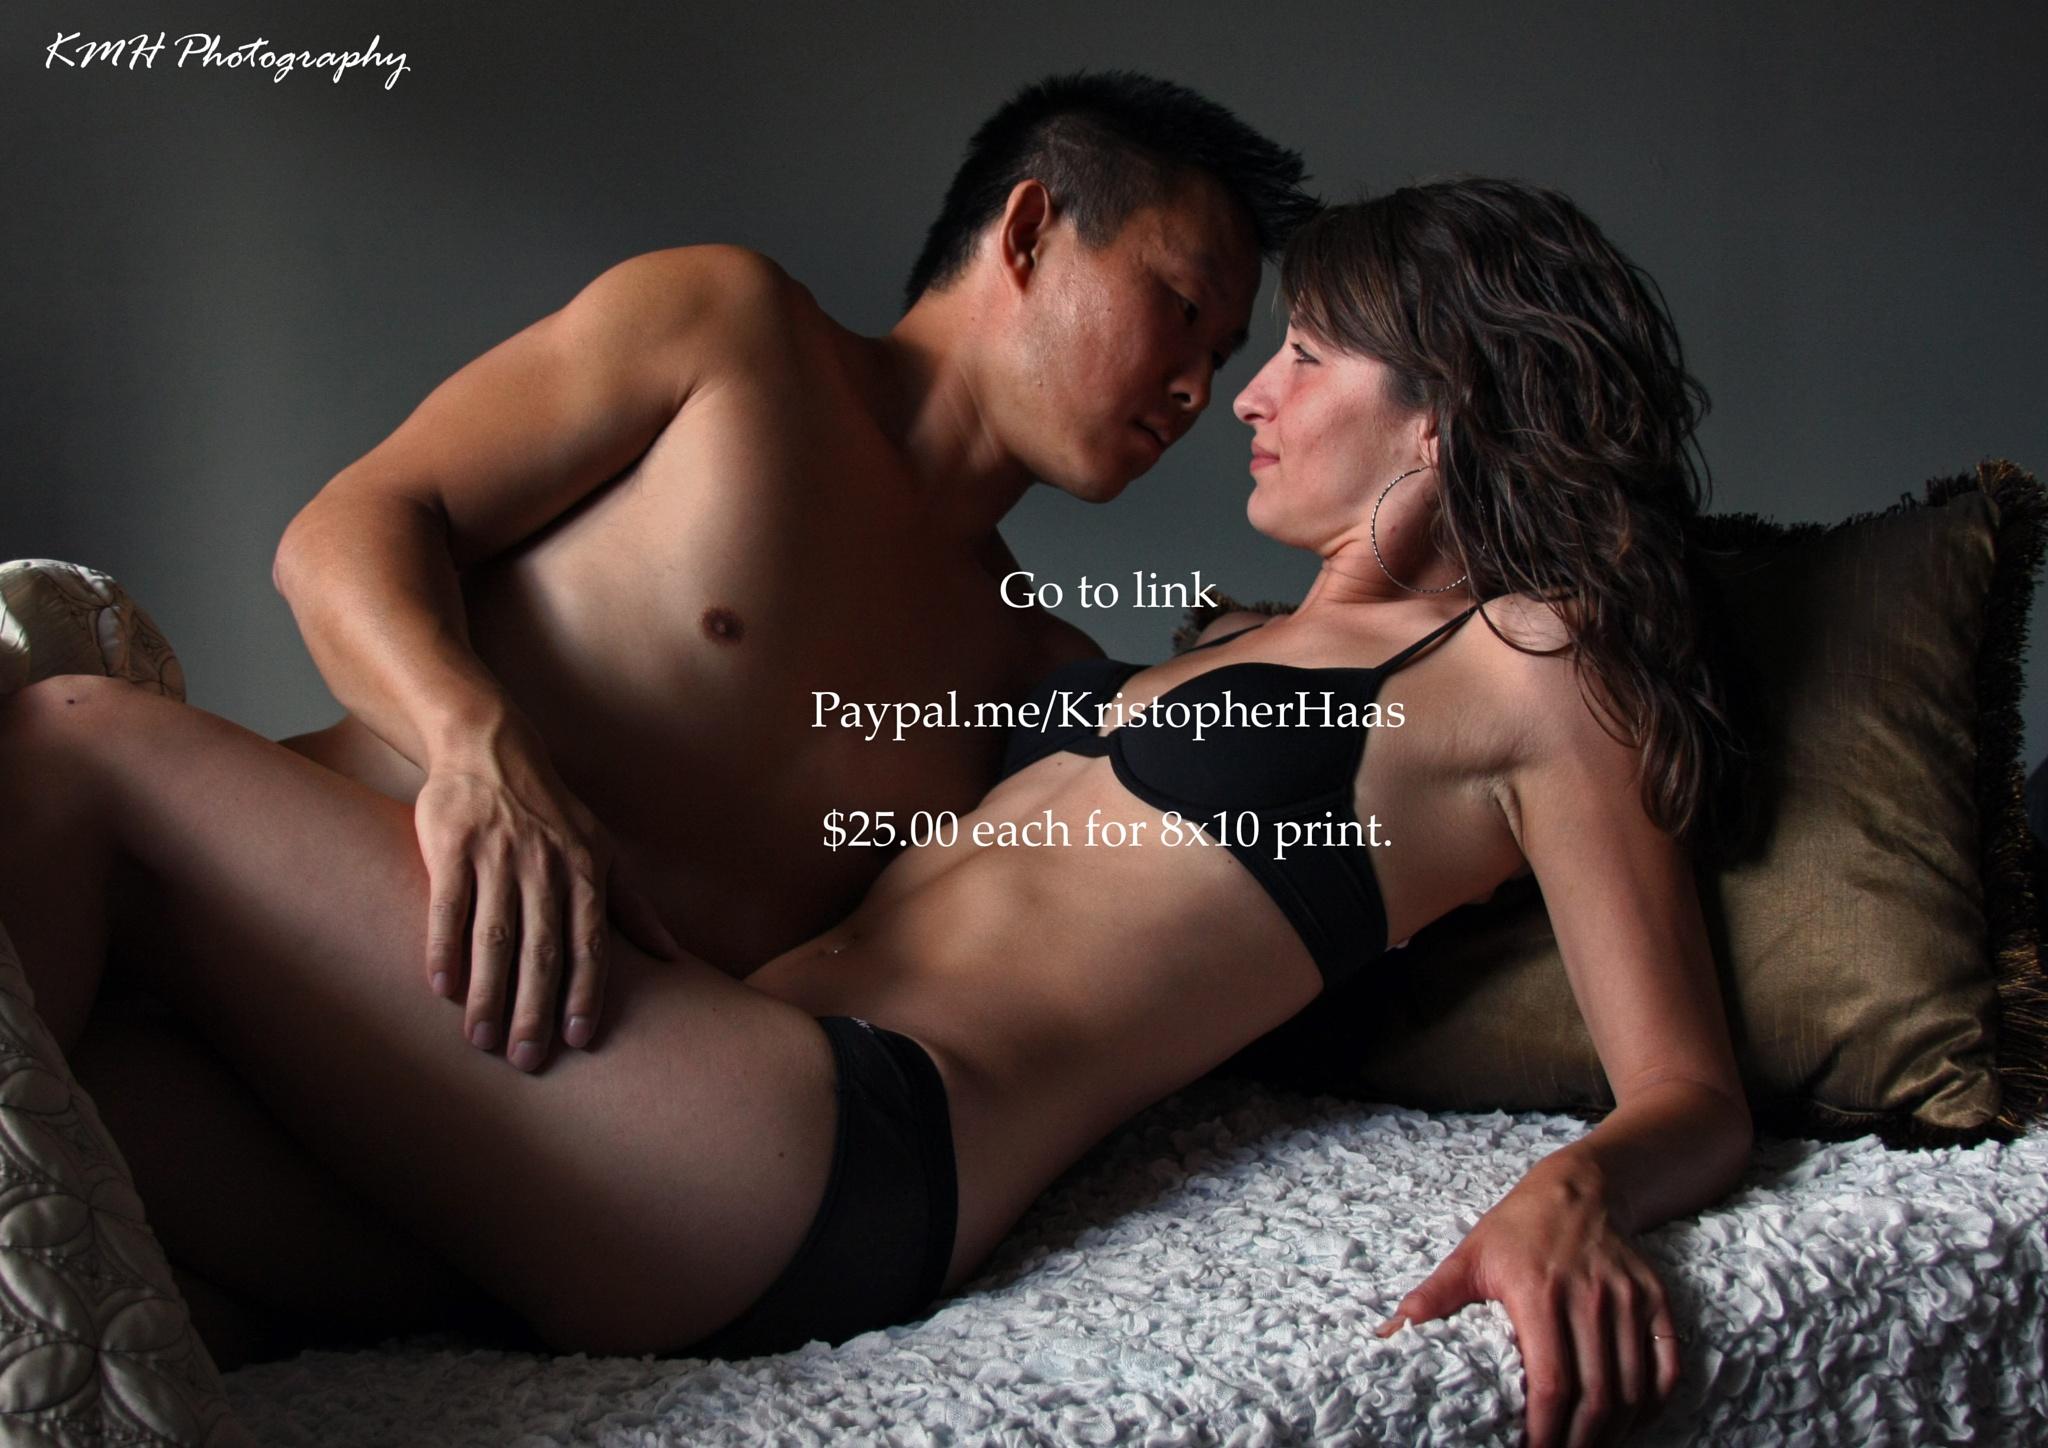 Go to link   Paypal.me/KristopherHaas by krishaas2012